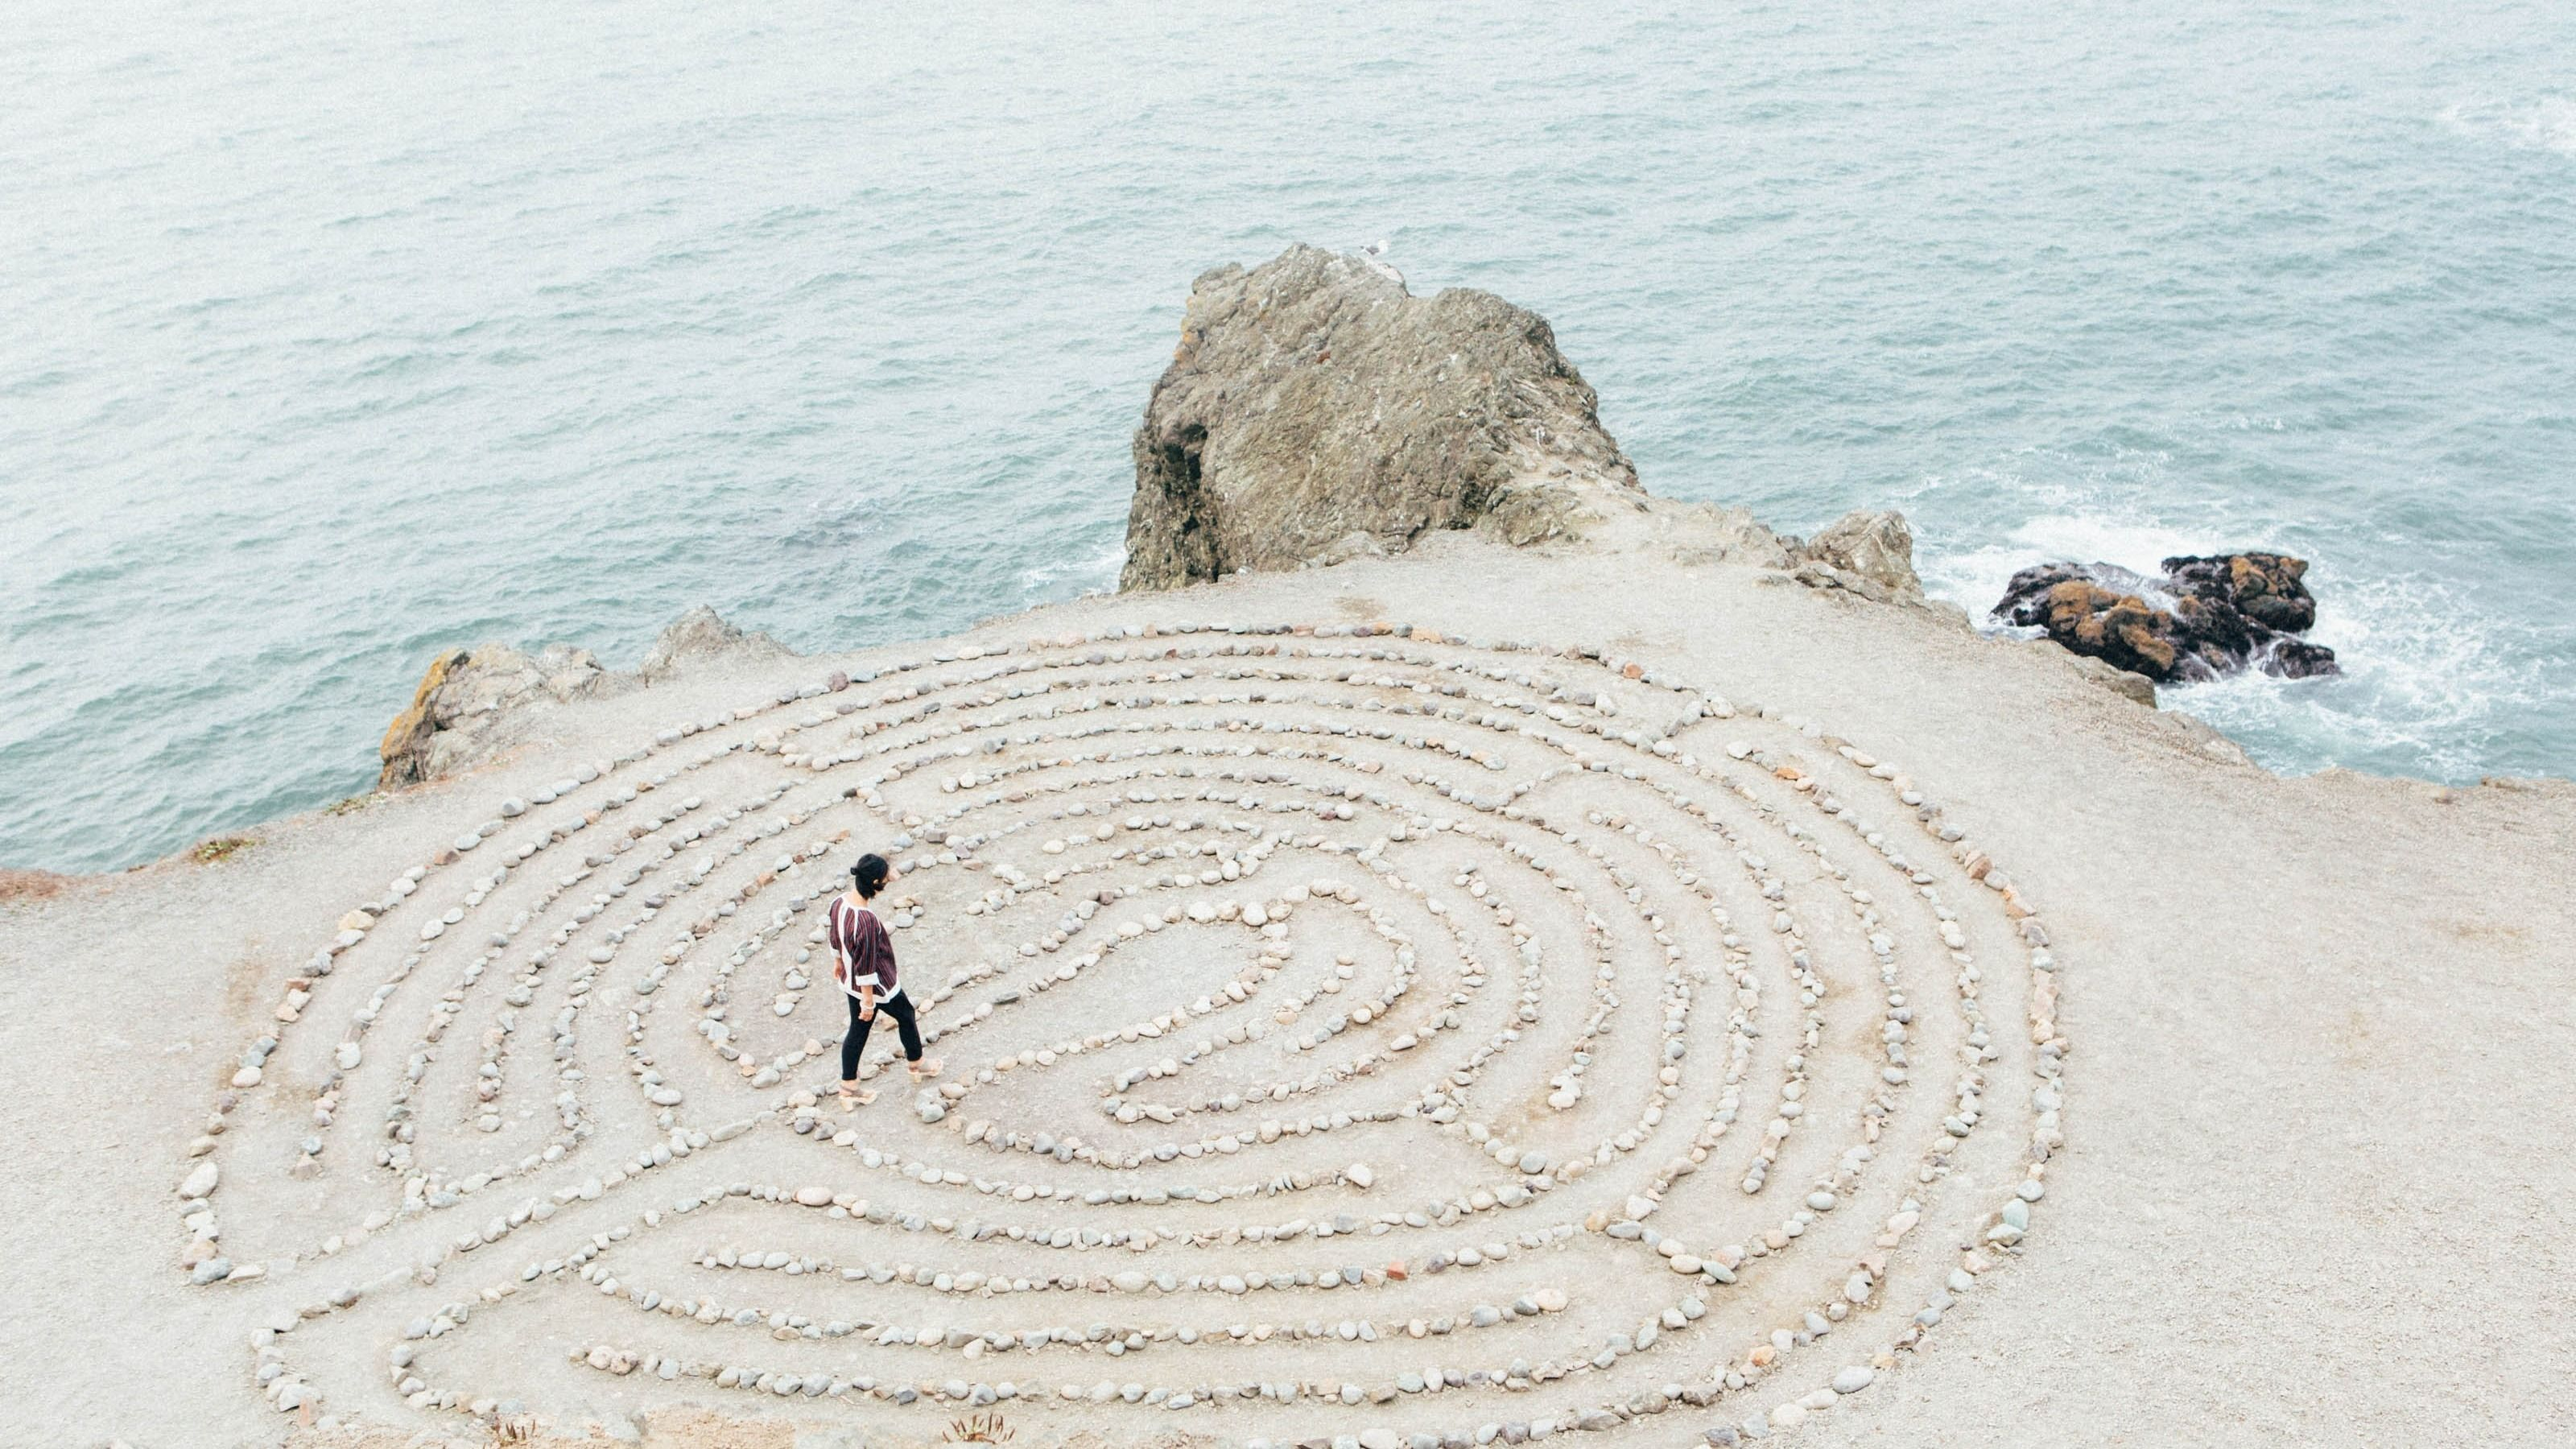 Spiritual Journey with Carla Fishinghawk